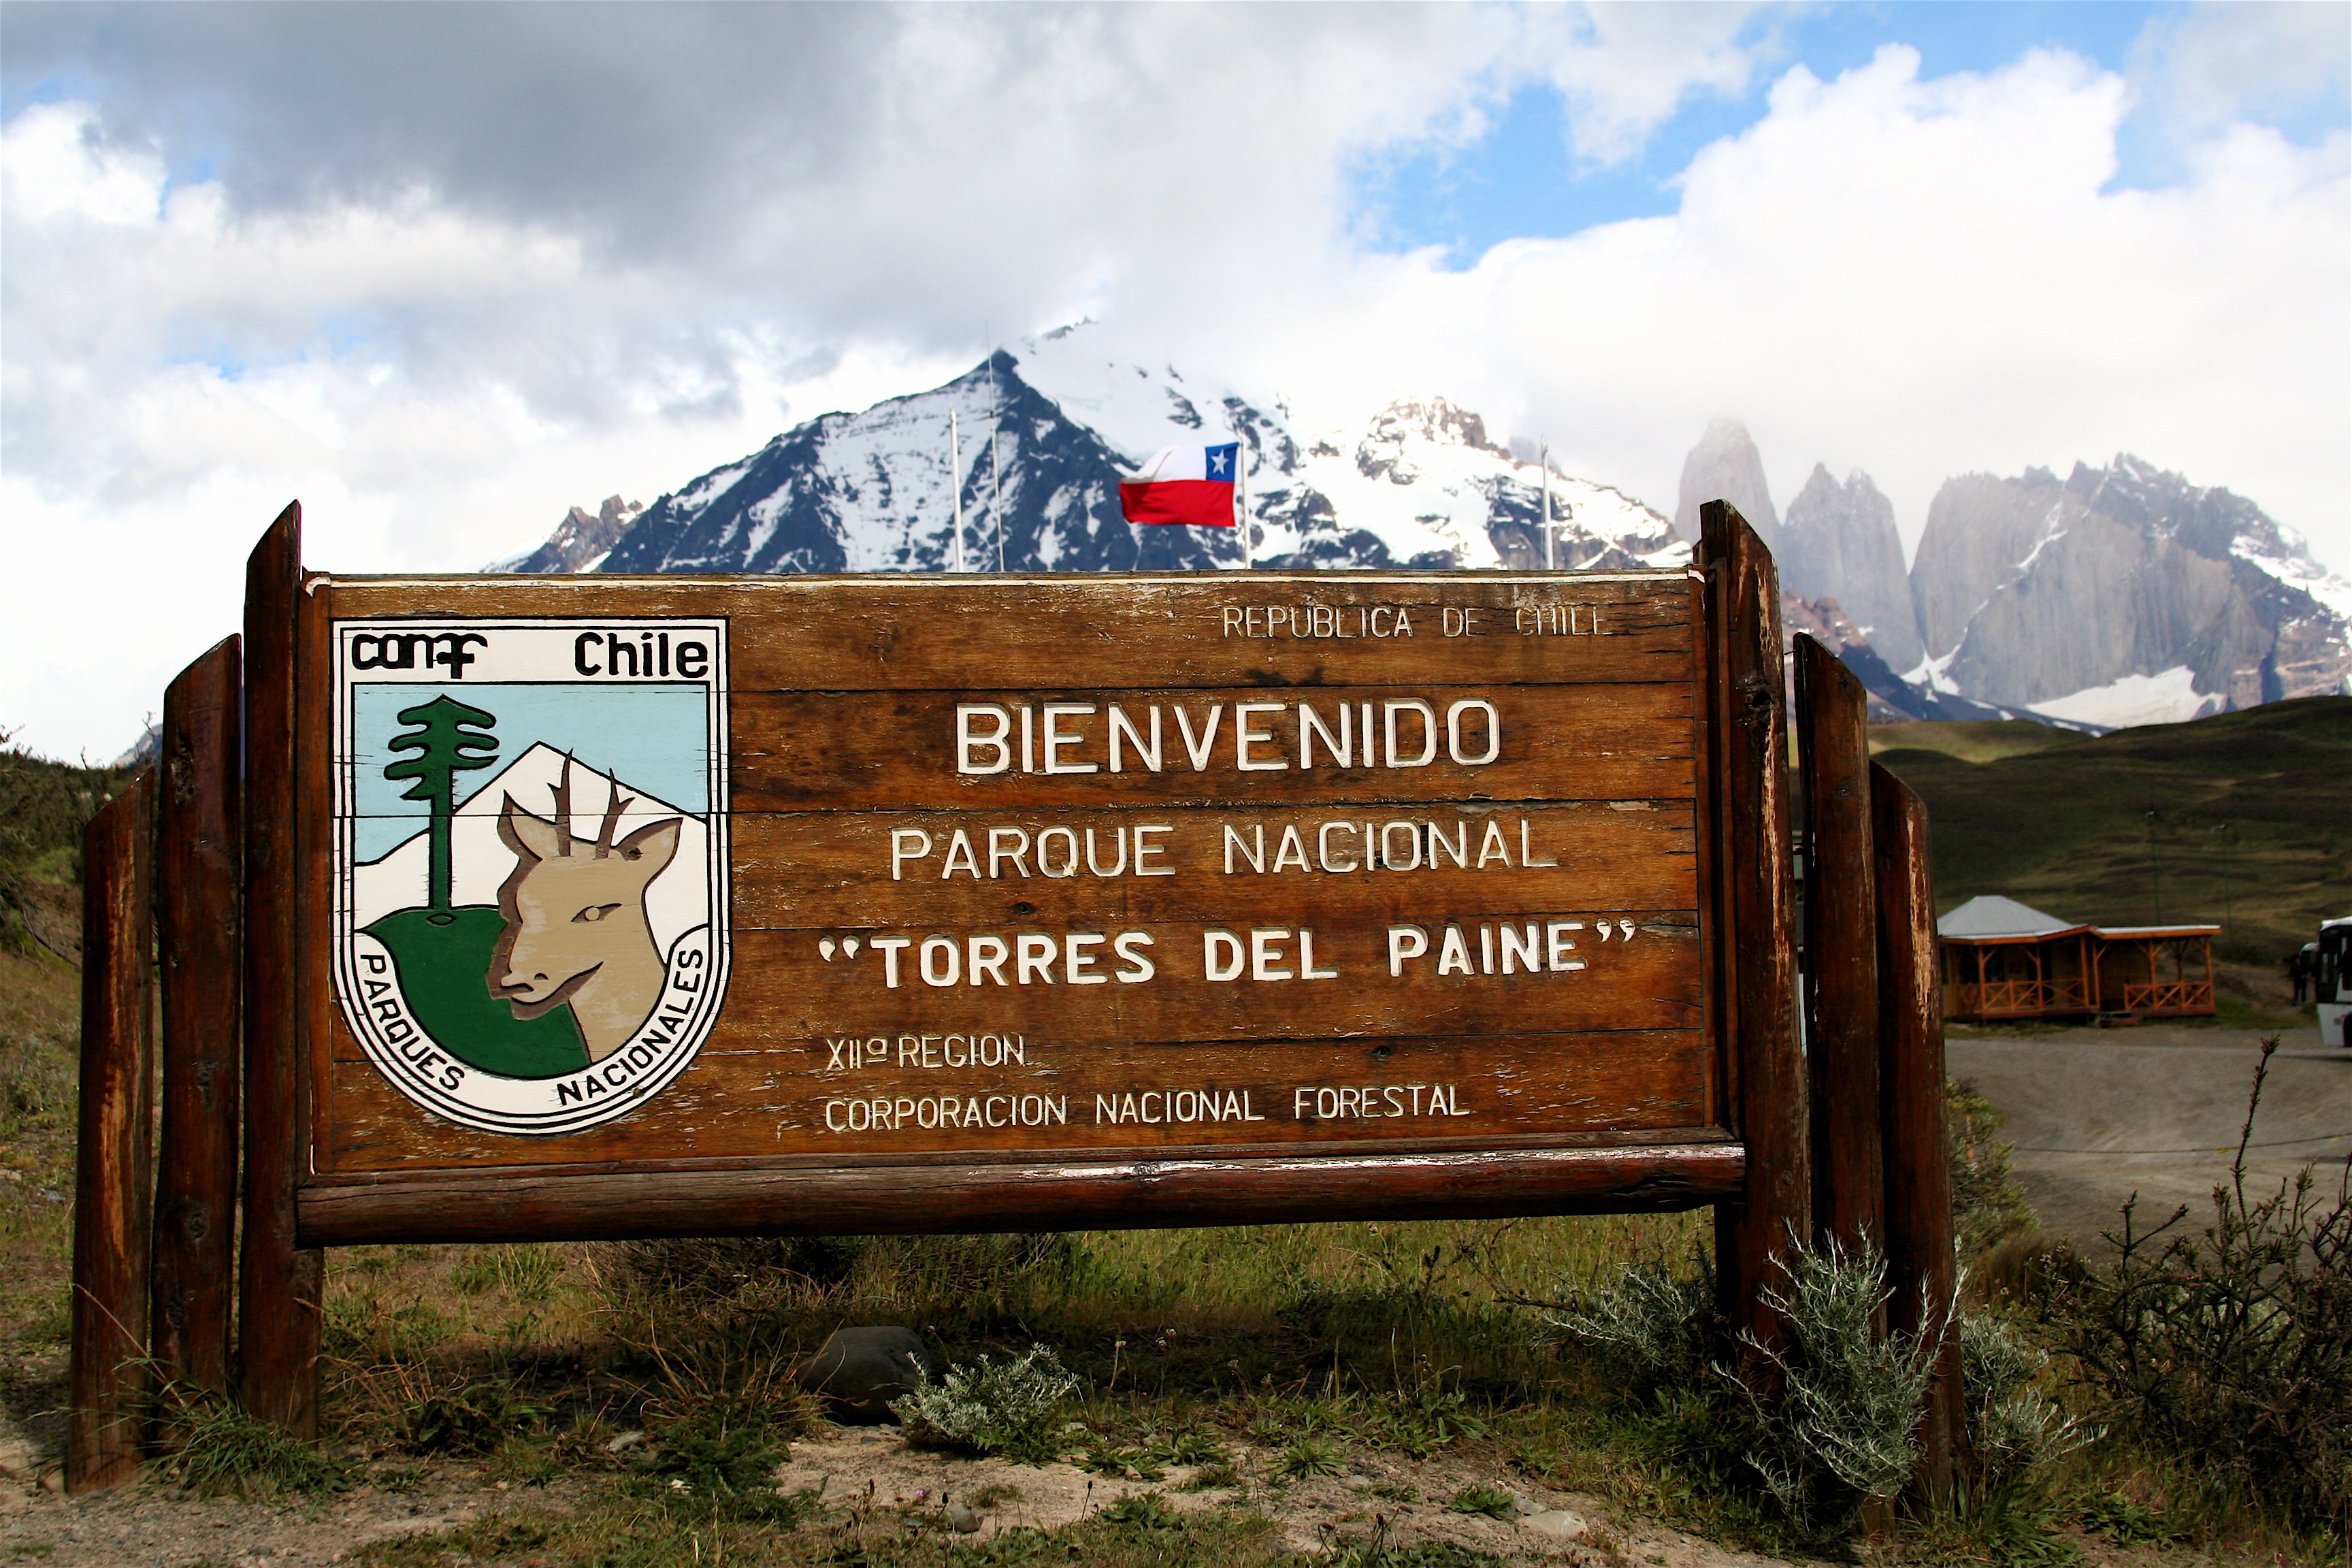 Depiction of Parque nacional Torres del Paine